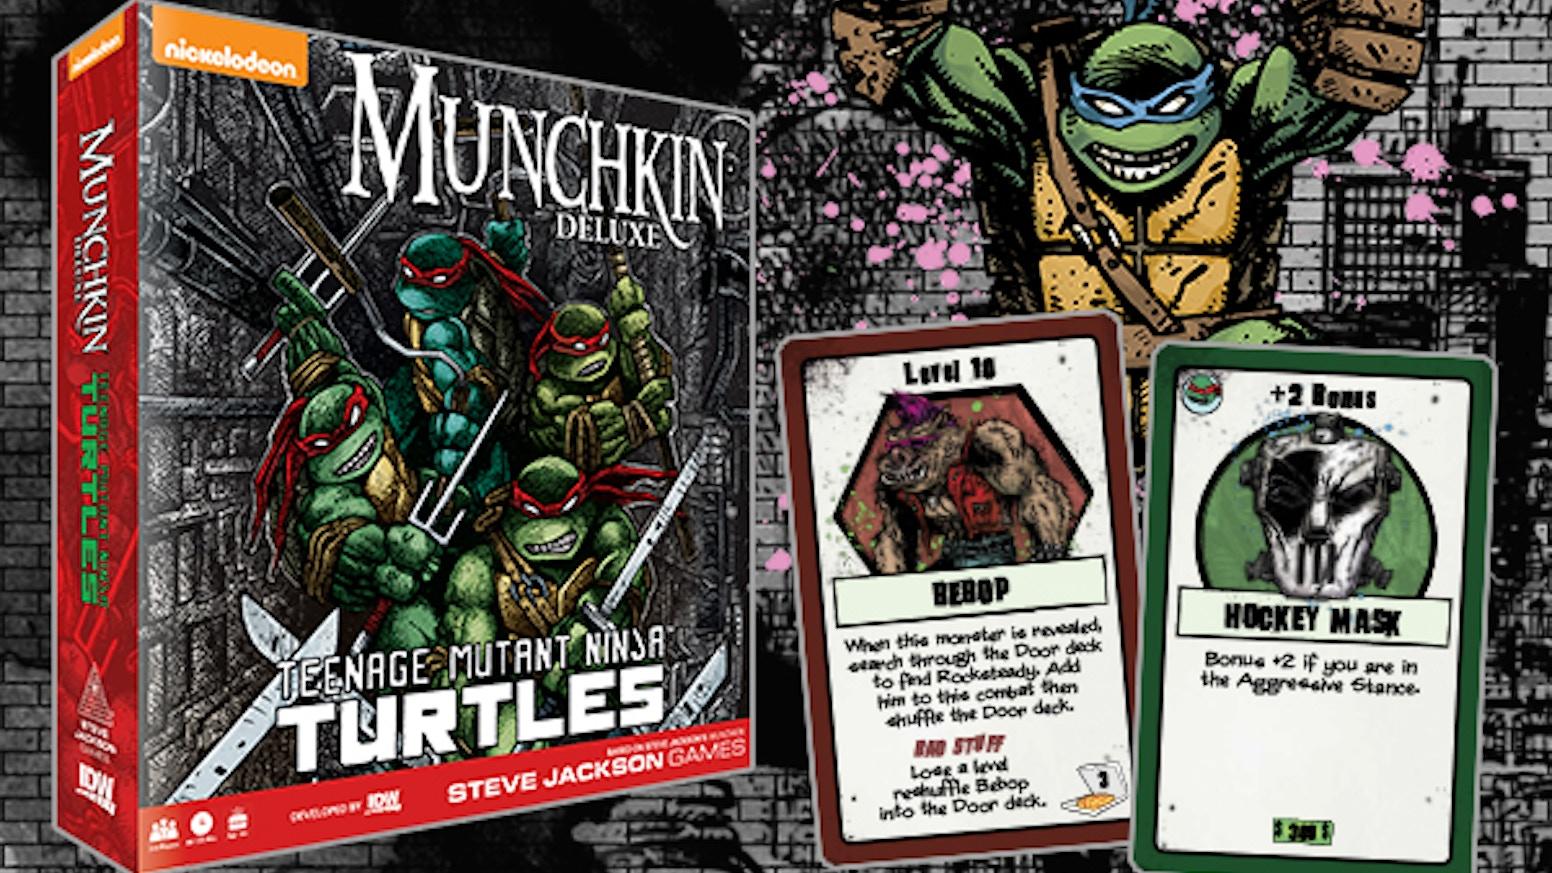 Munchkin Teenage Mutant Ninja Turtles By Idw Games Kickstarter